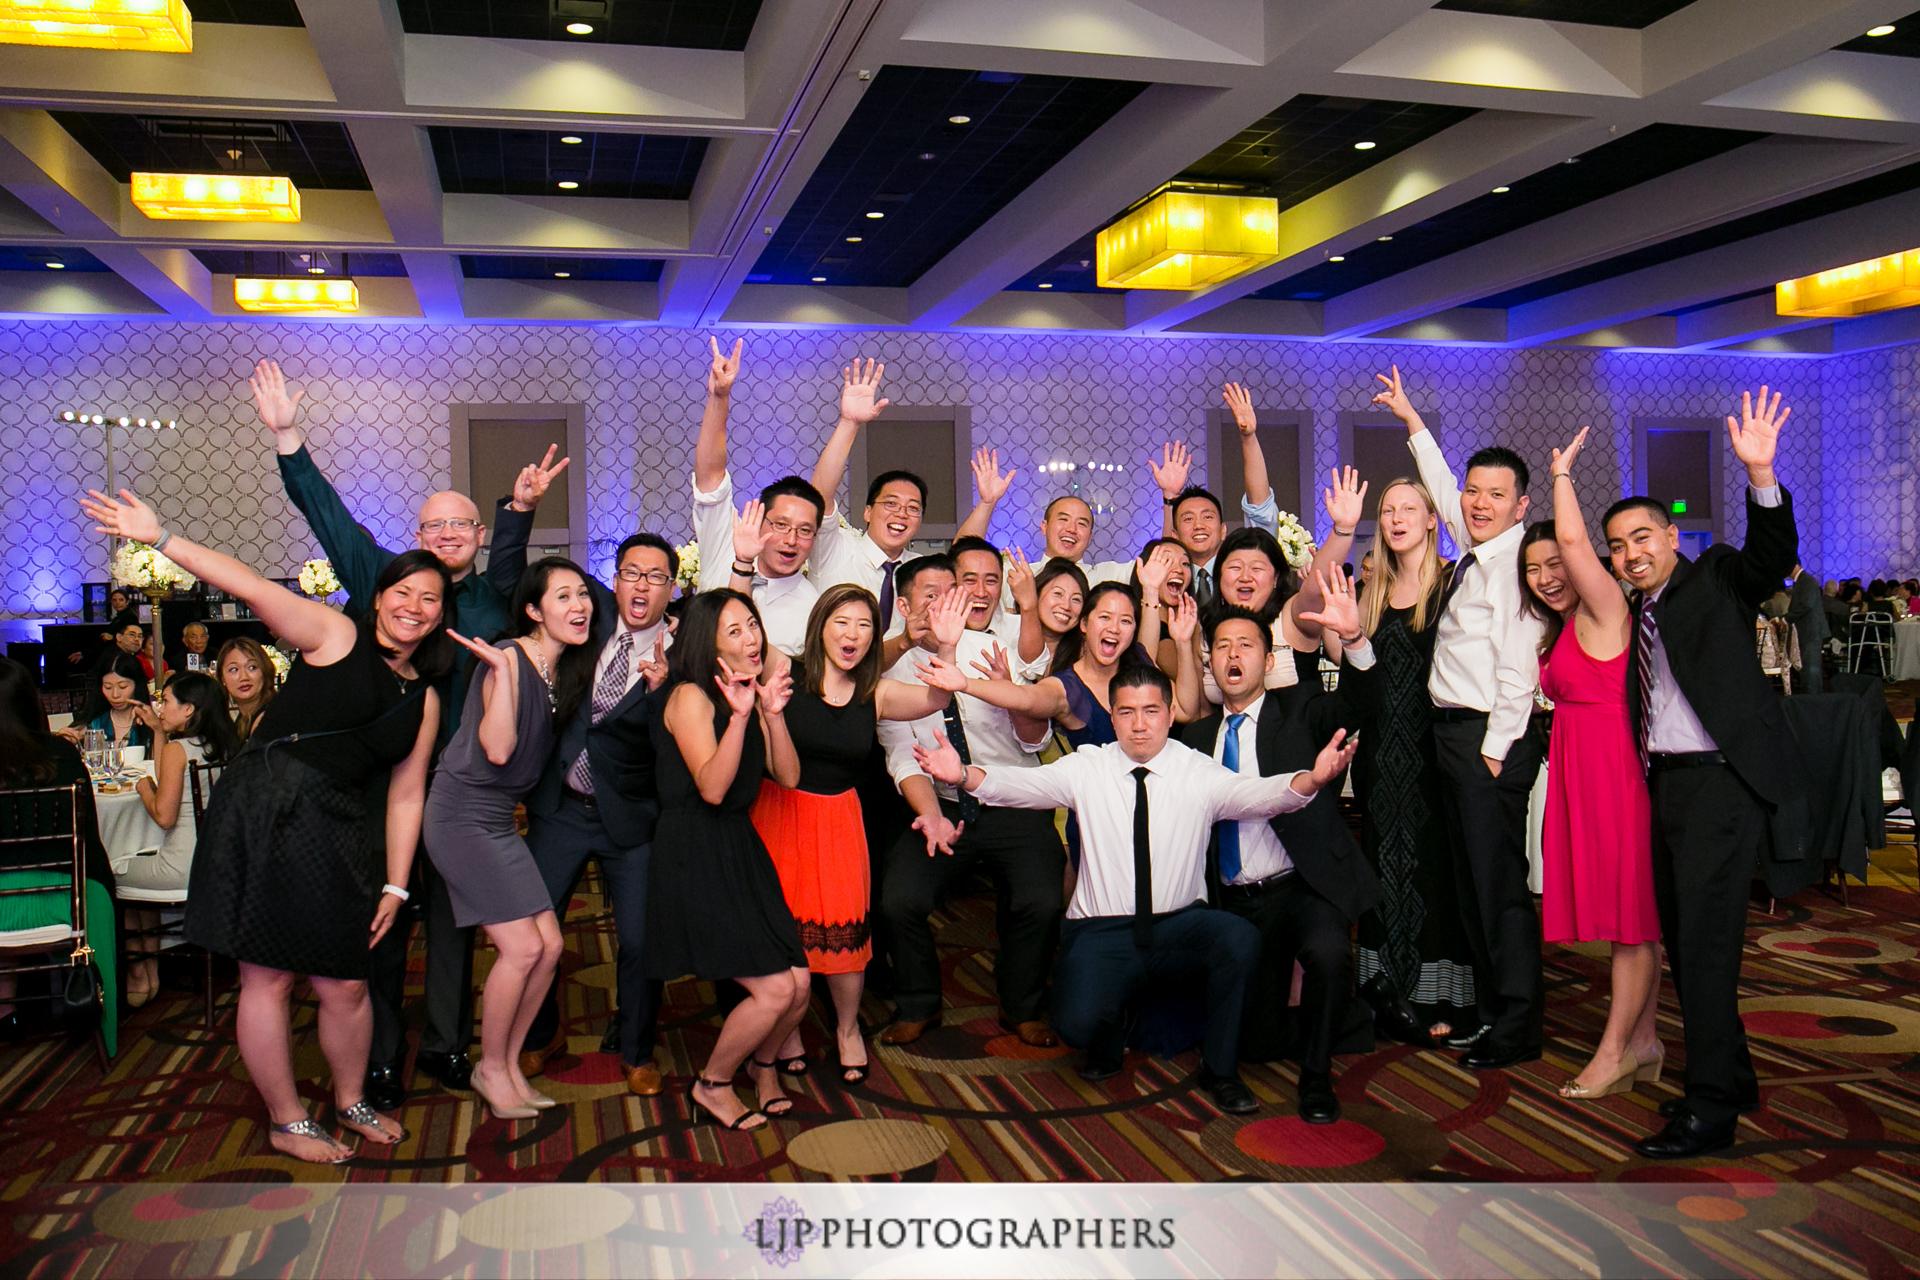 32-jw-marriott-los-angeles-wedding-photographer-wedding-reception-photos